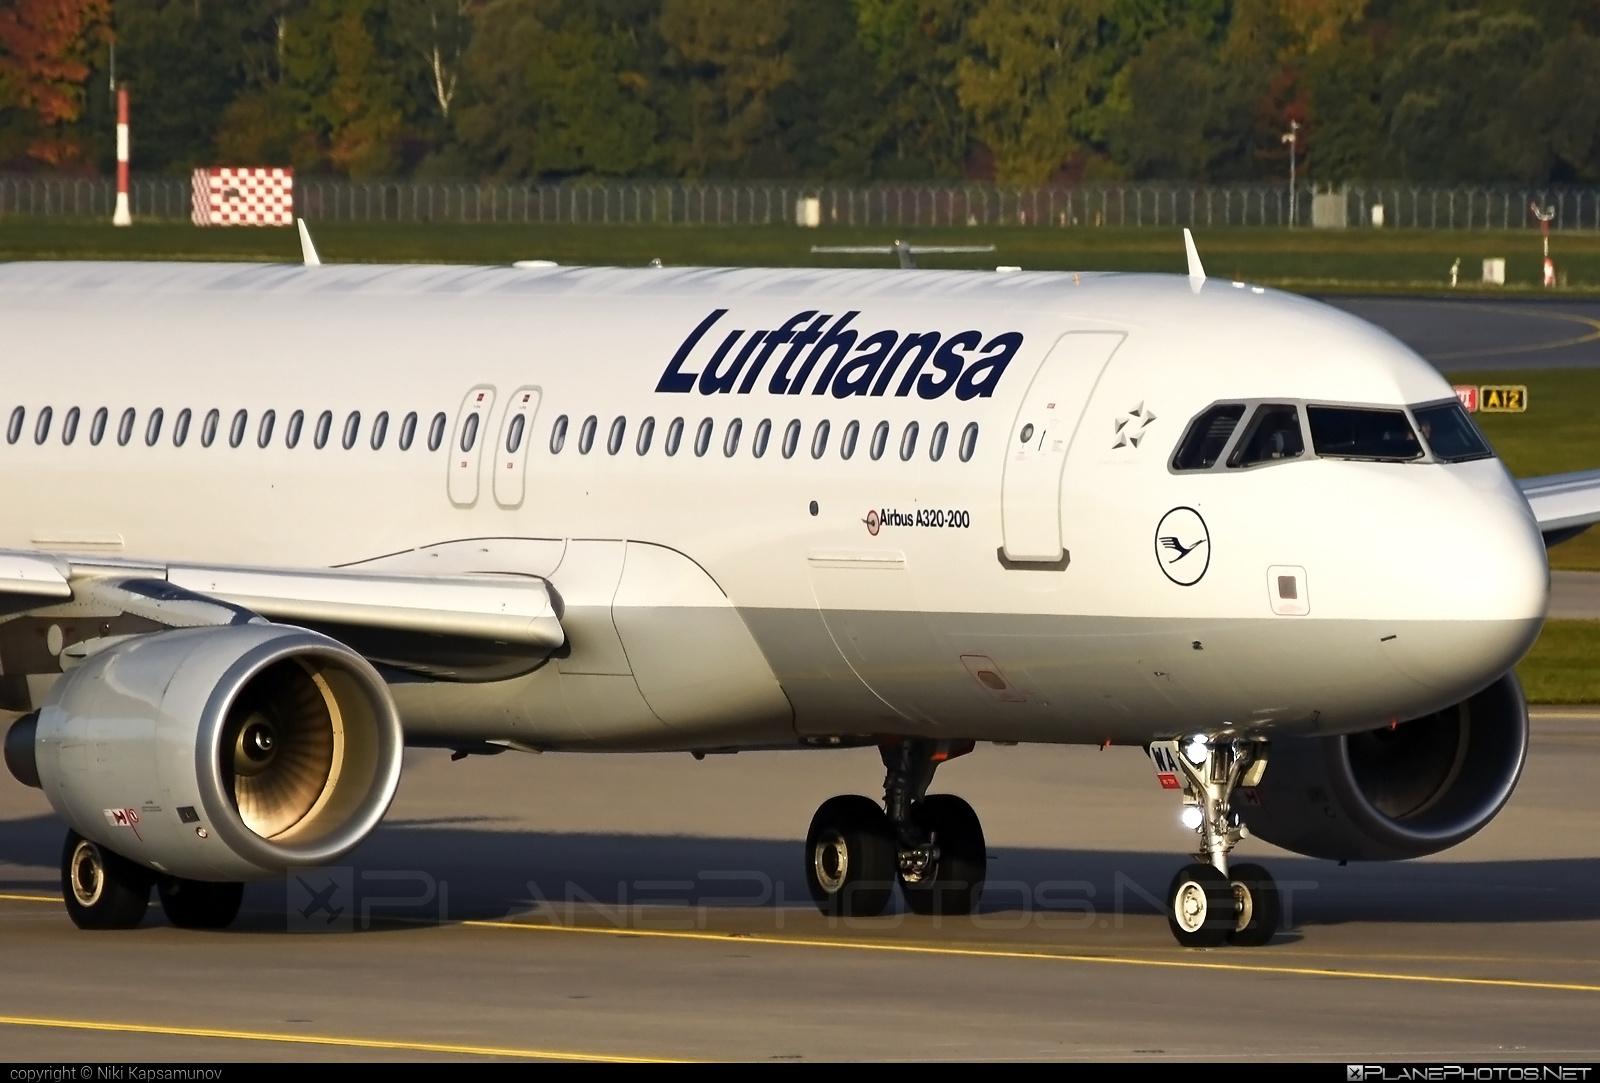 Airbus A320-214 - D-AIWA operated by Lufthansa #a320 #a320family #airbus #airbus320 #lufthansa